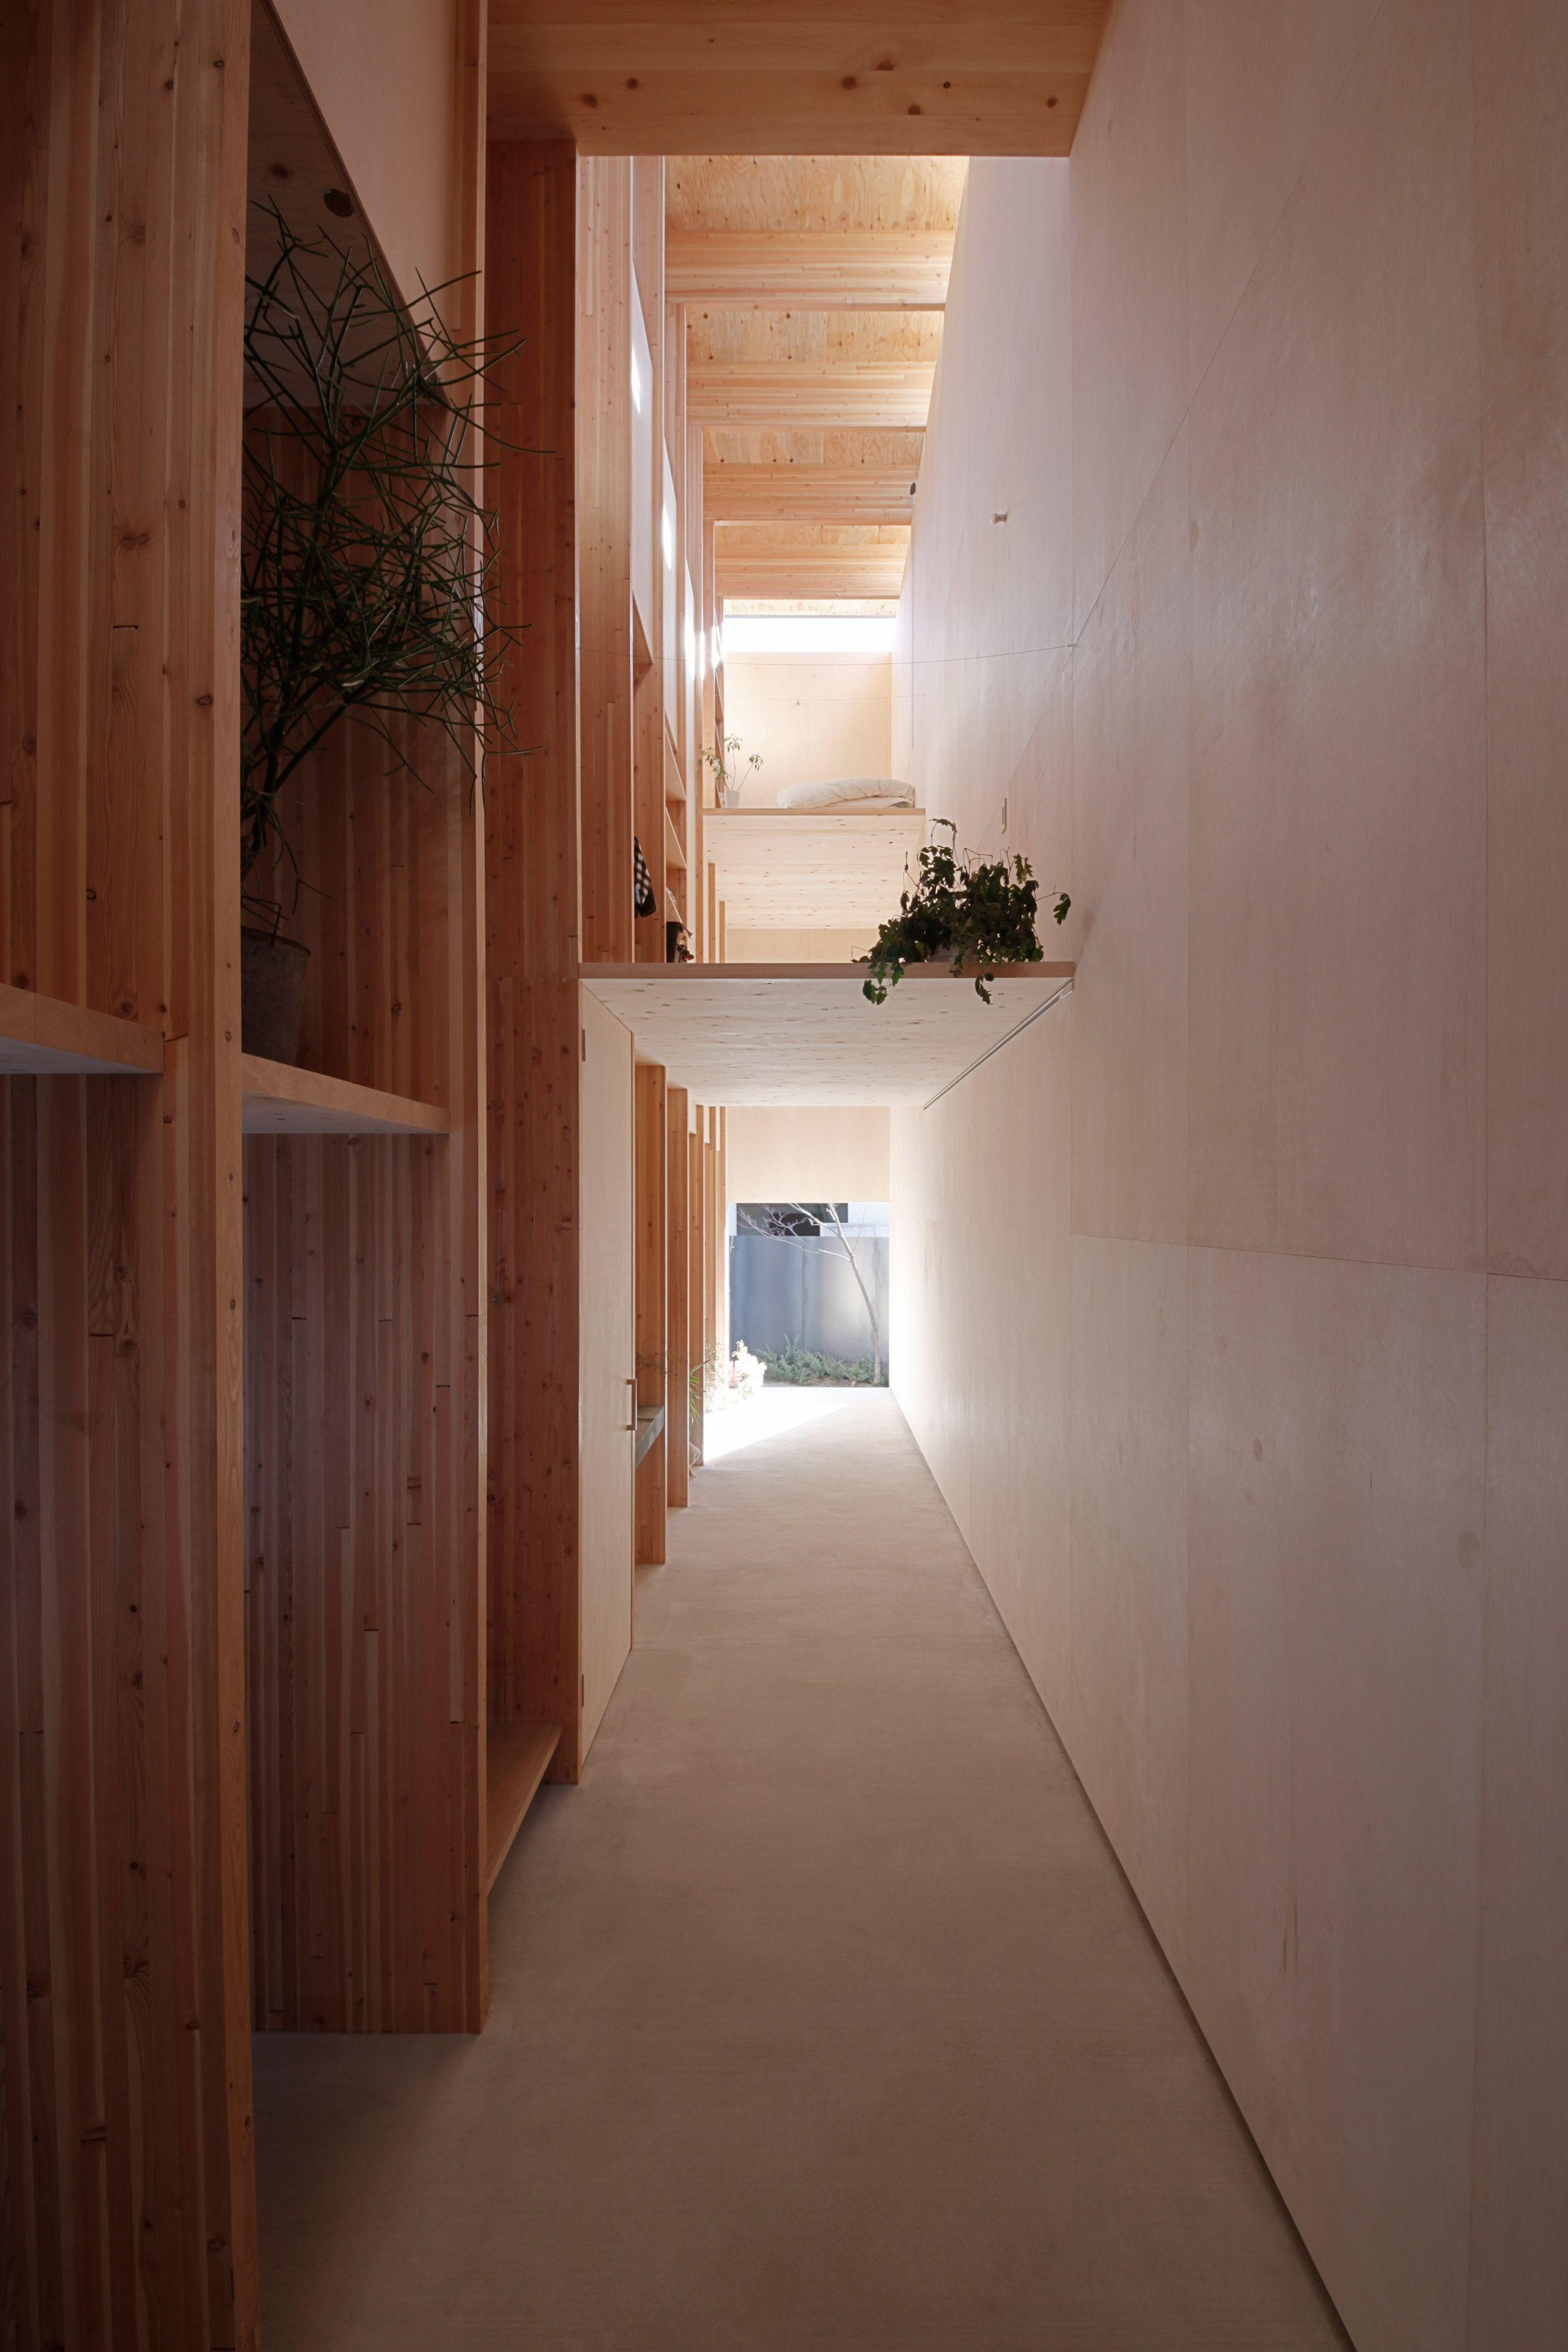 Katsutoshi Sasakis Minimalist Home Has A Dark Exterior And A